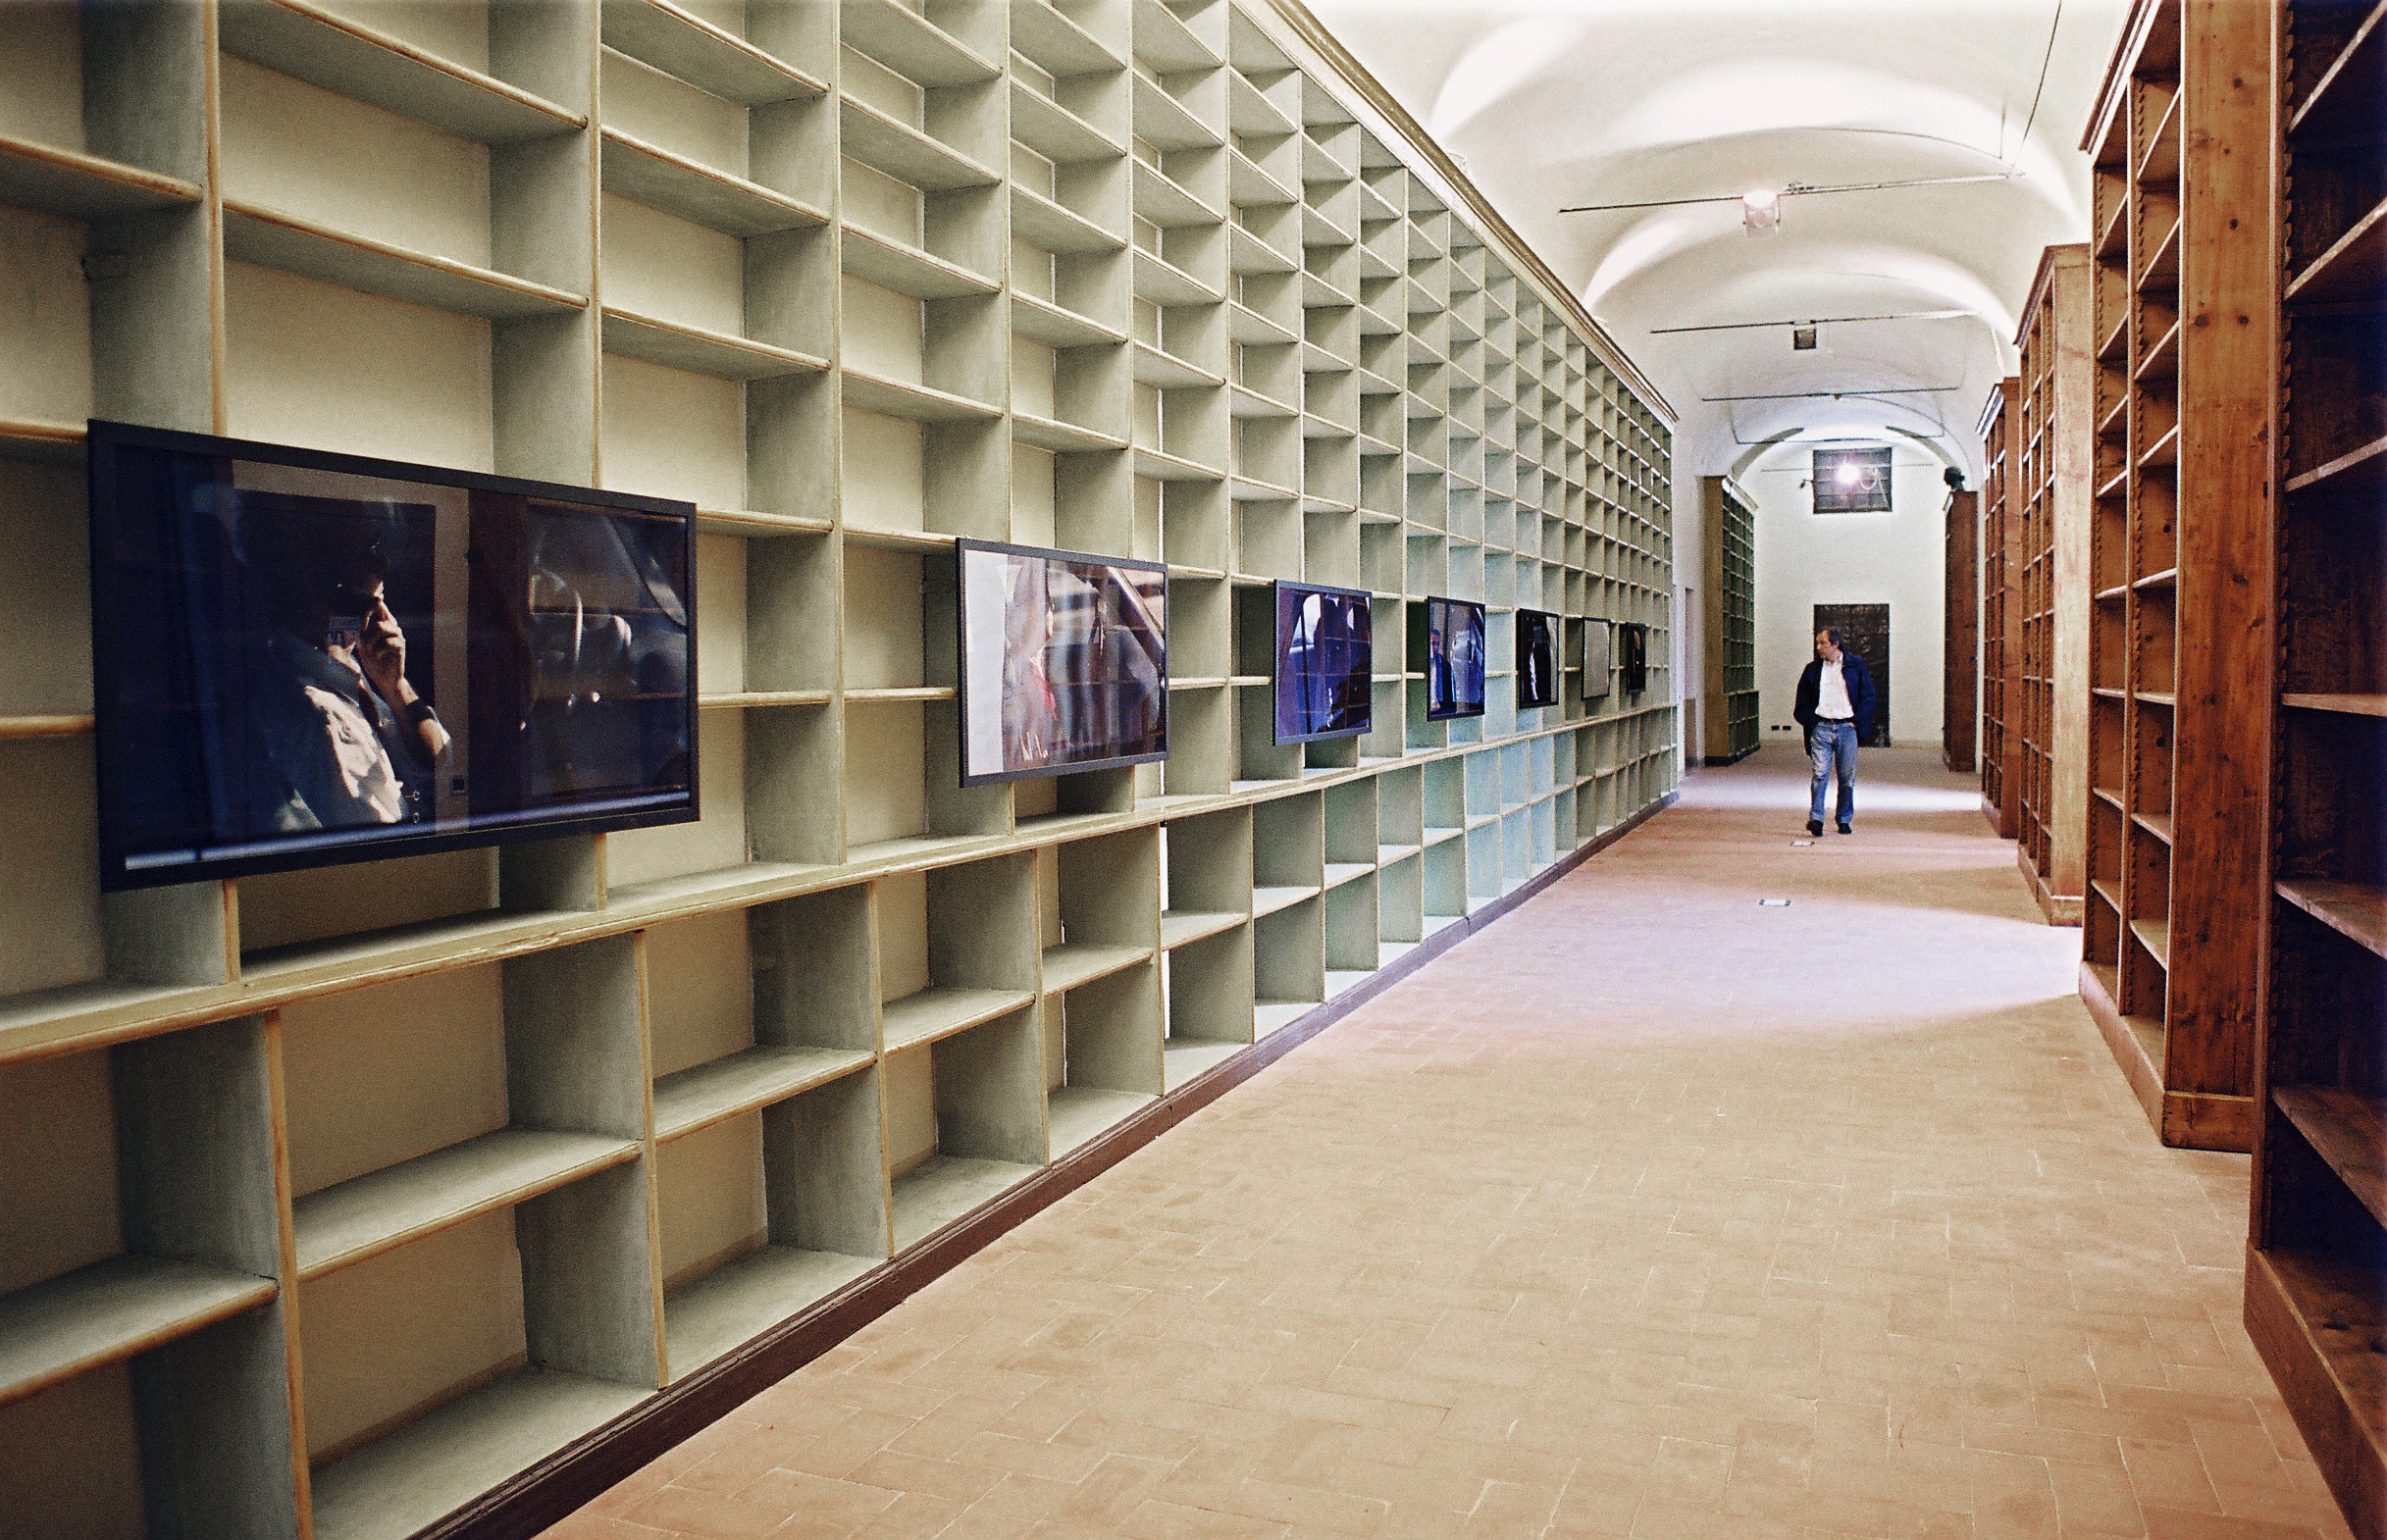 Mostre, Biblioteca Panizzi